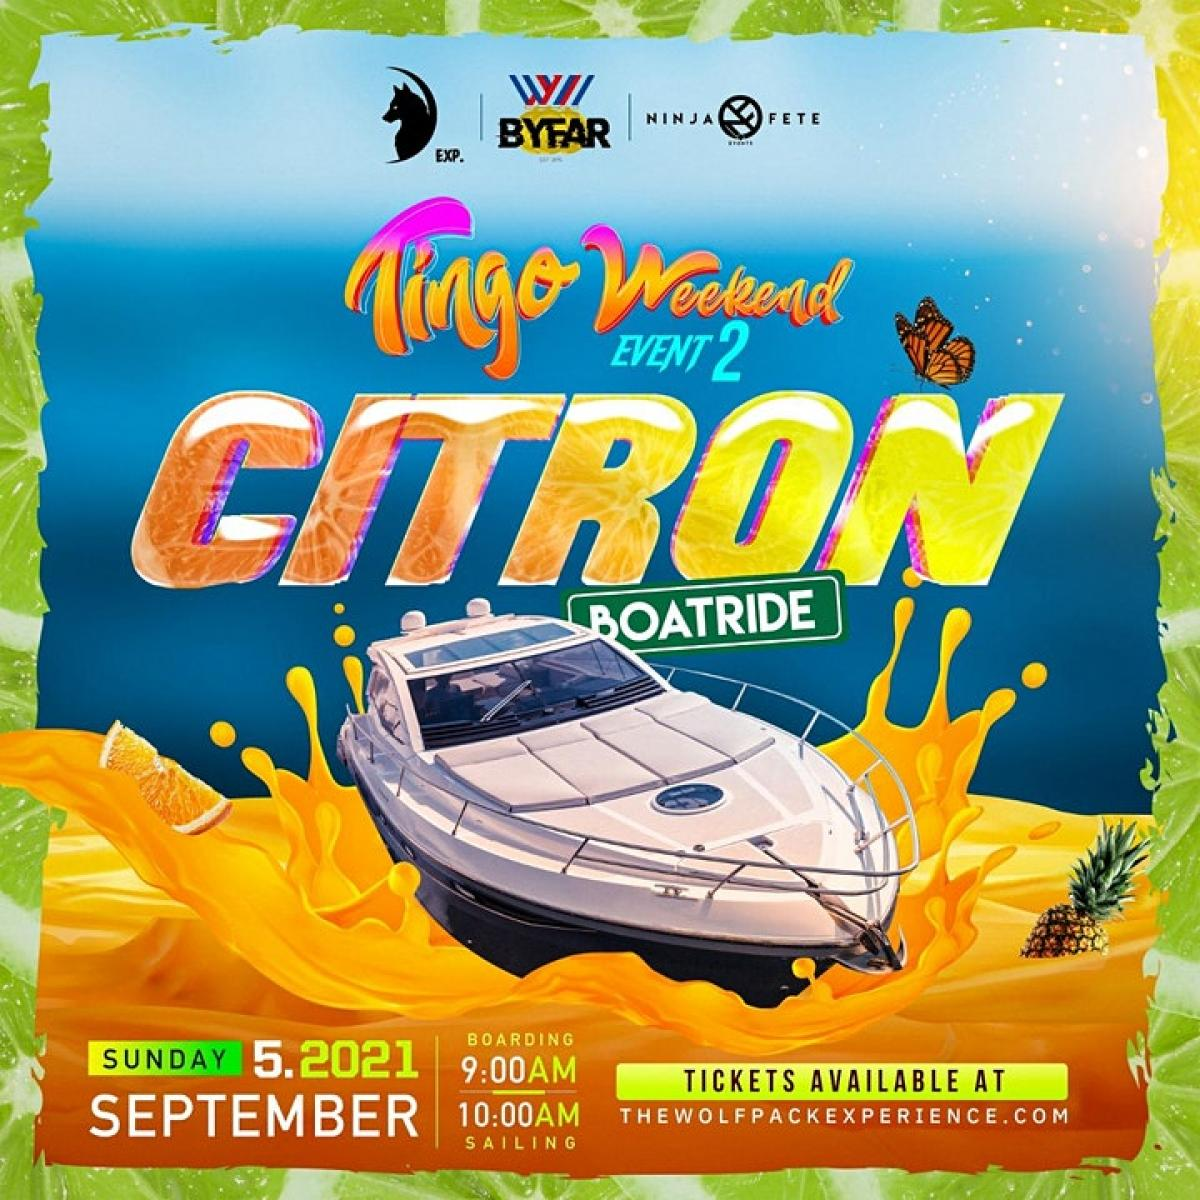 Citron Boatride flyer or graphic.